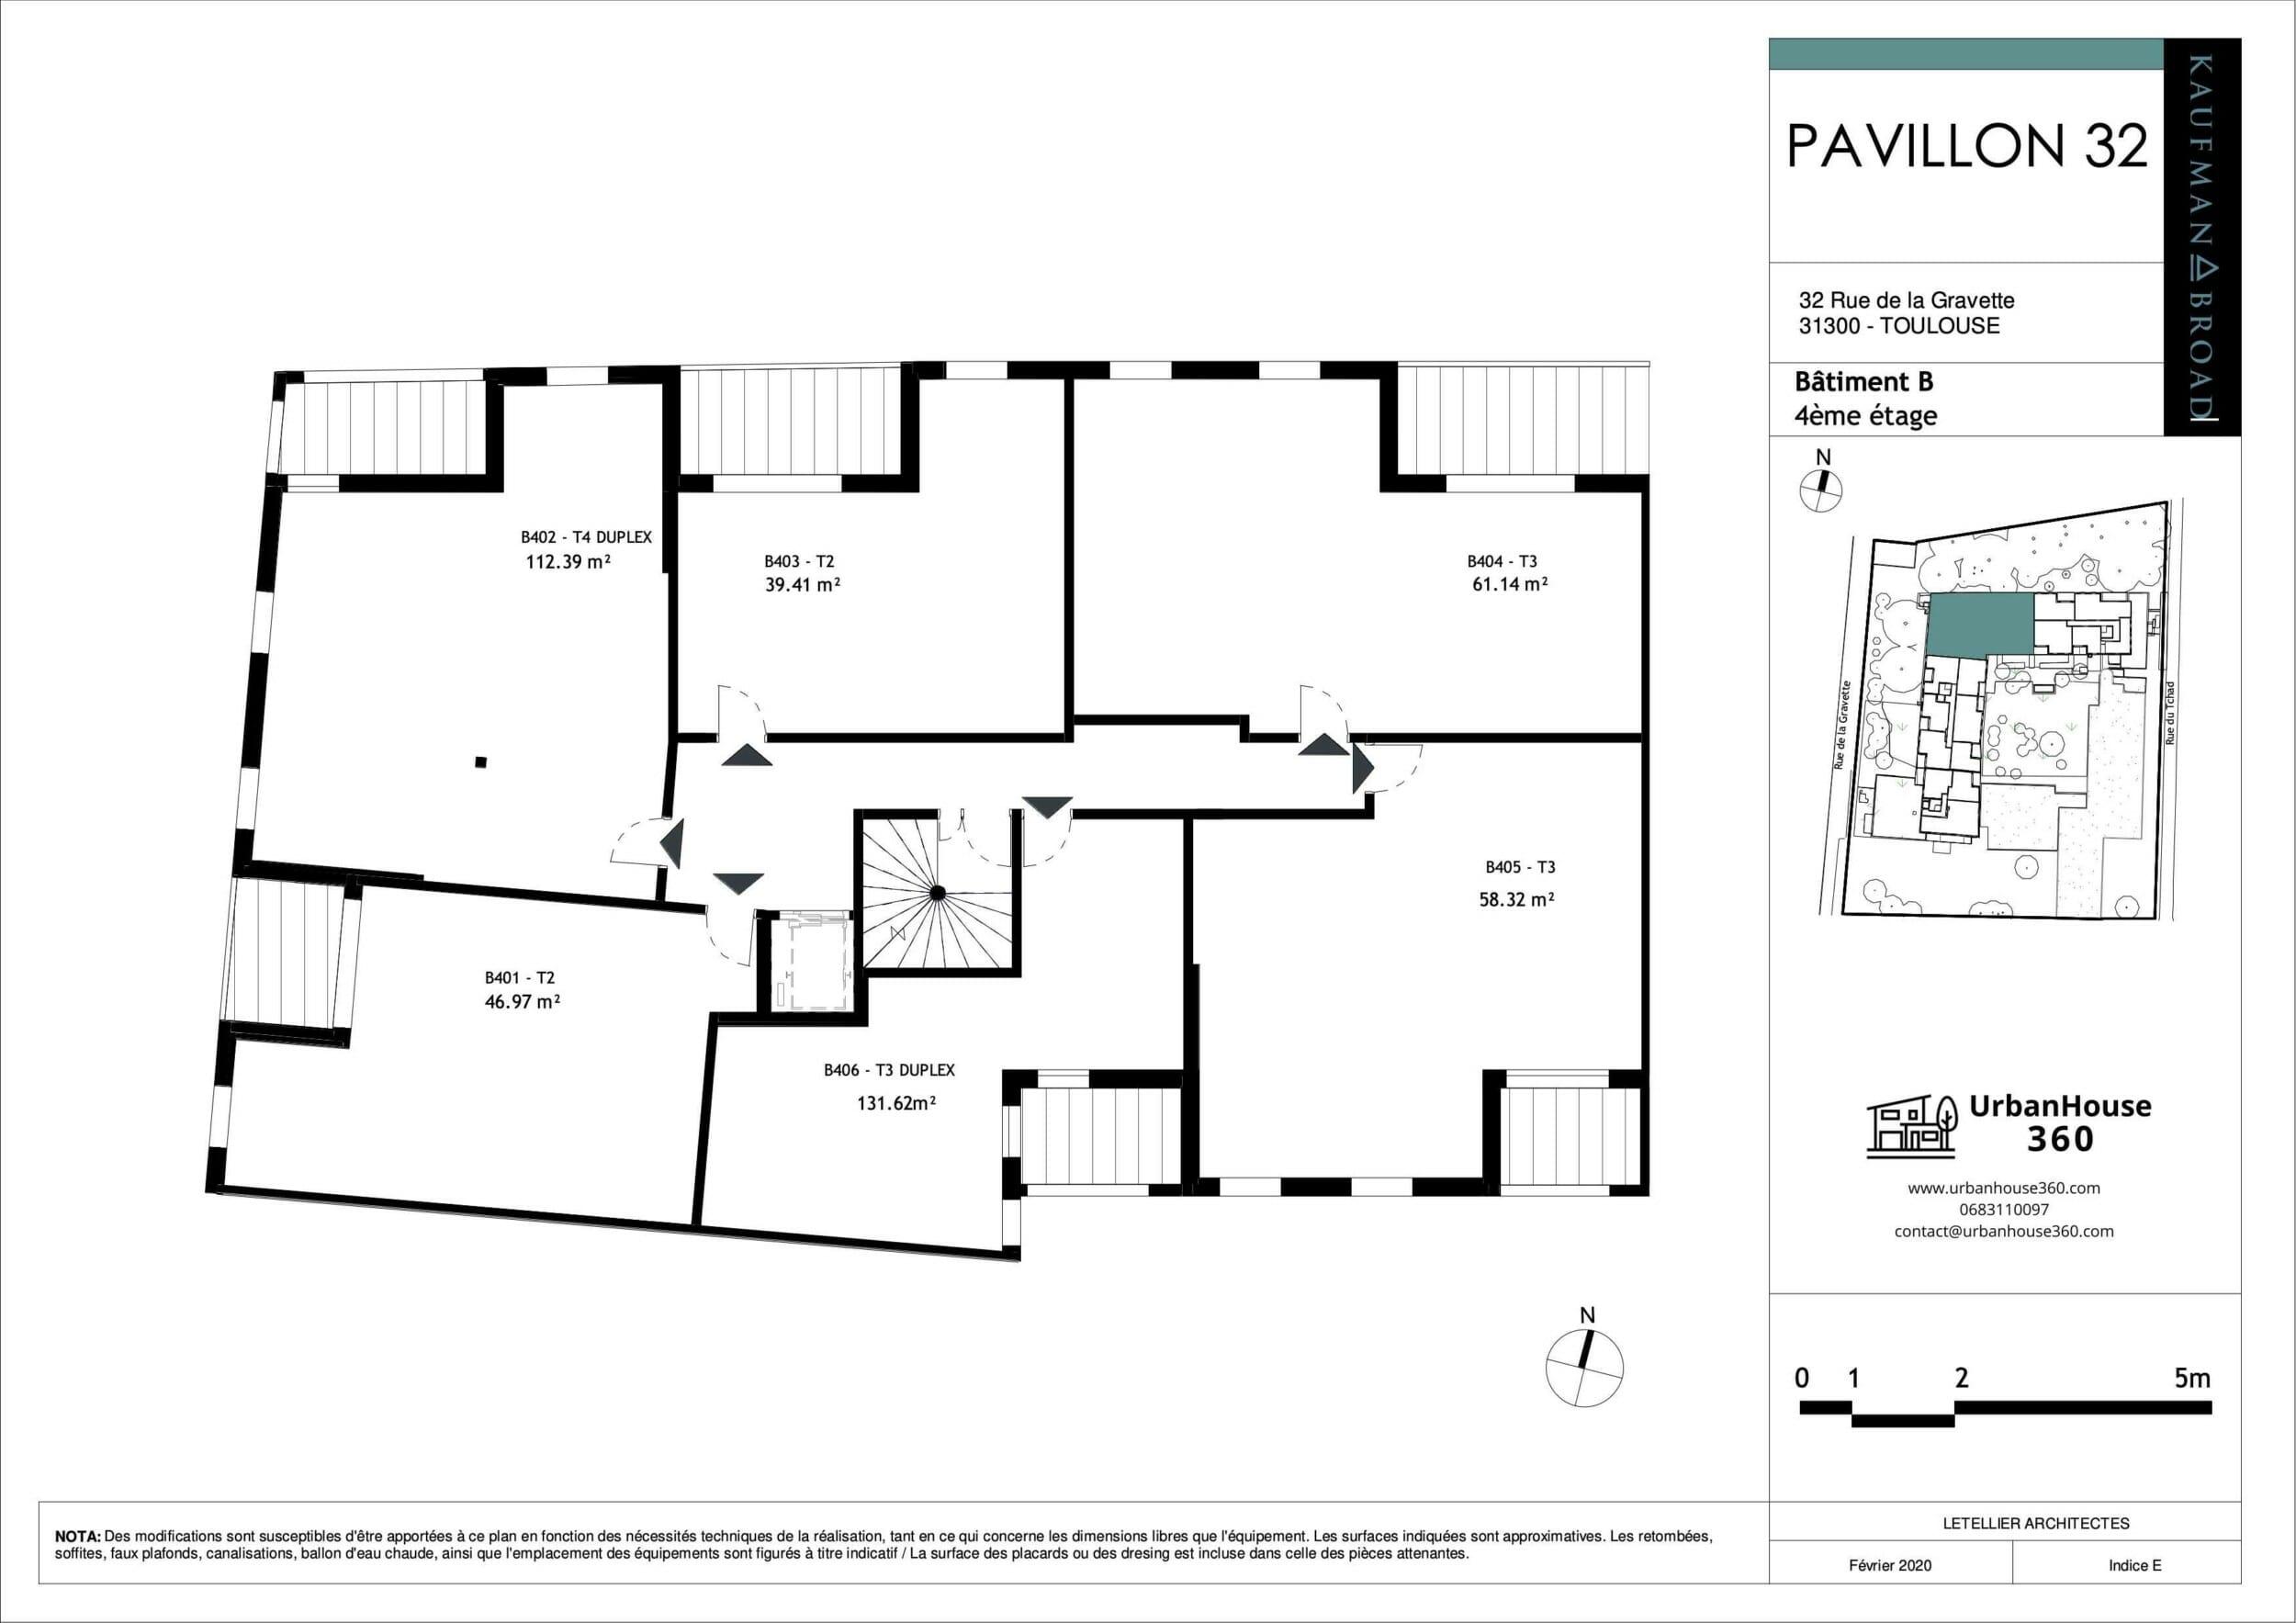 UrbanHouse360-Pavillon32-B_R+4_ind E 2